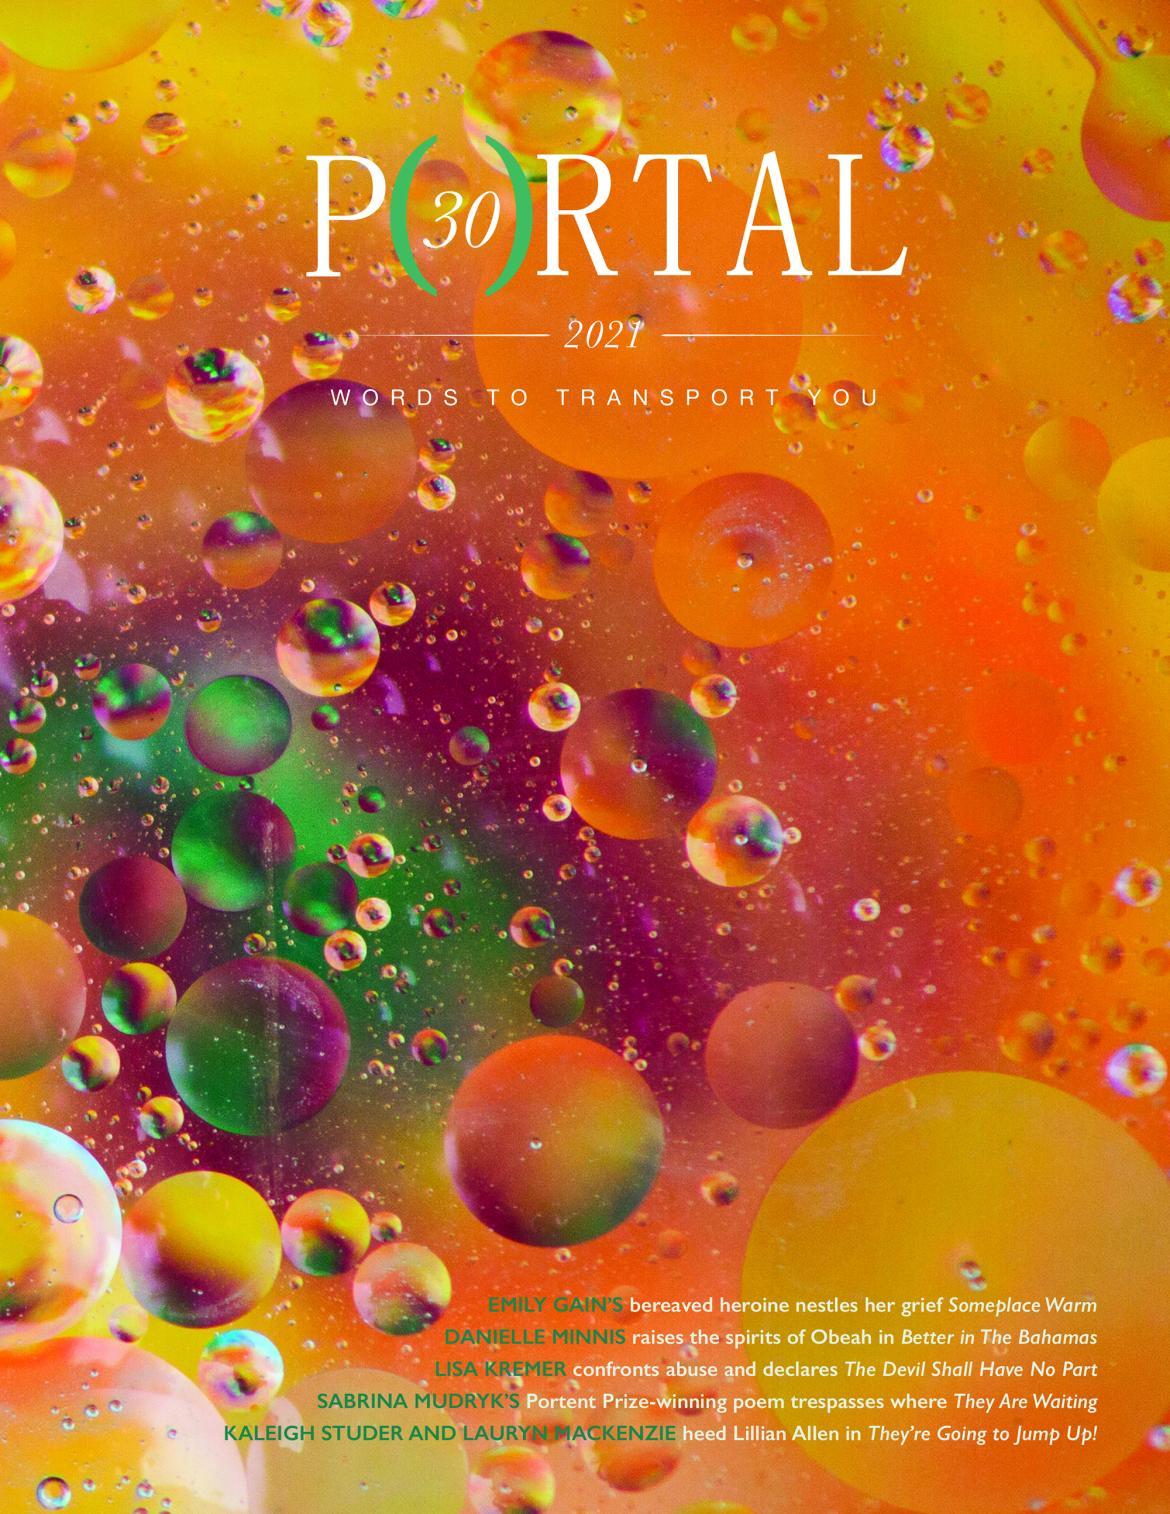 Portal magazine's 30th anniversary cover pops with orange and yellow bubbles